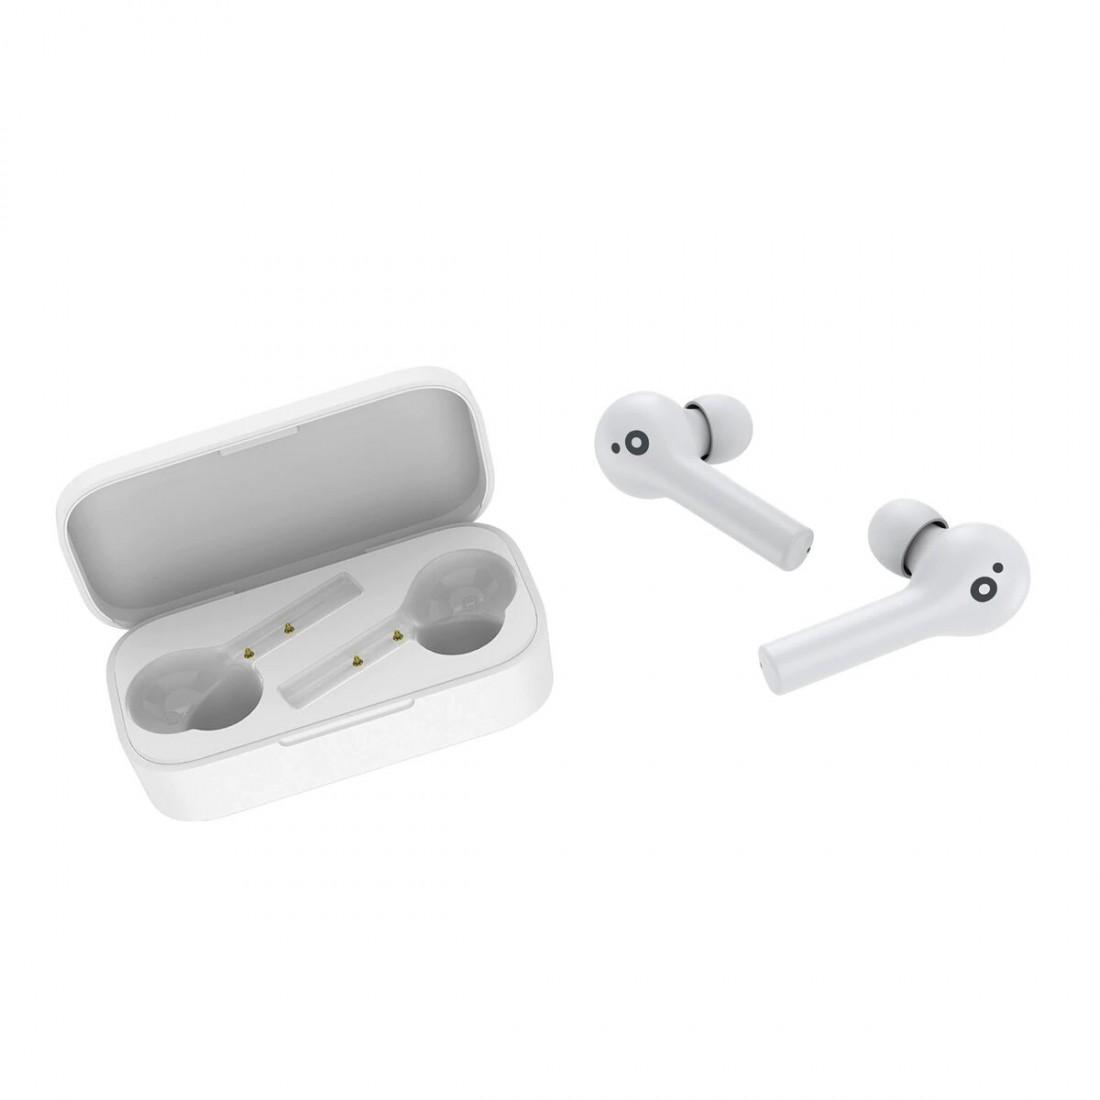 Auriculares inalámbricos SUNSTECH WAVEPODS TOUCH, Bluetooth, color Blanco